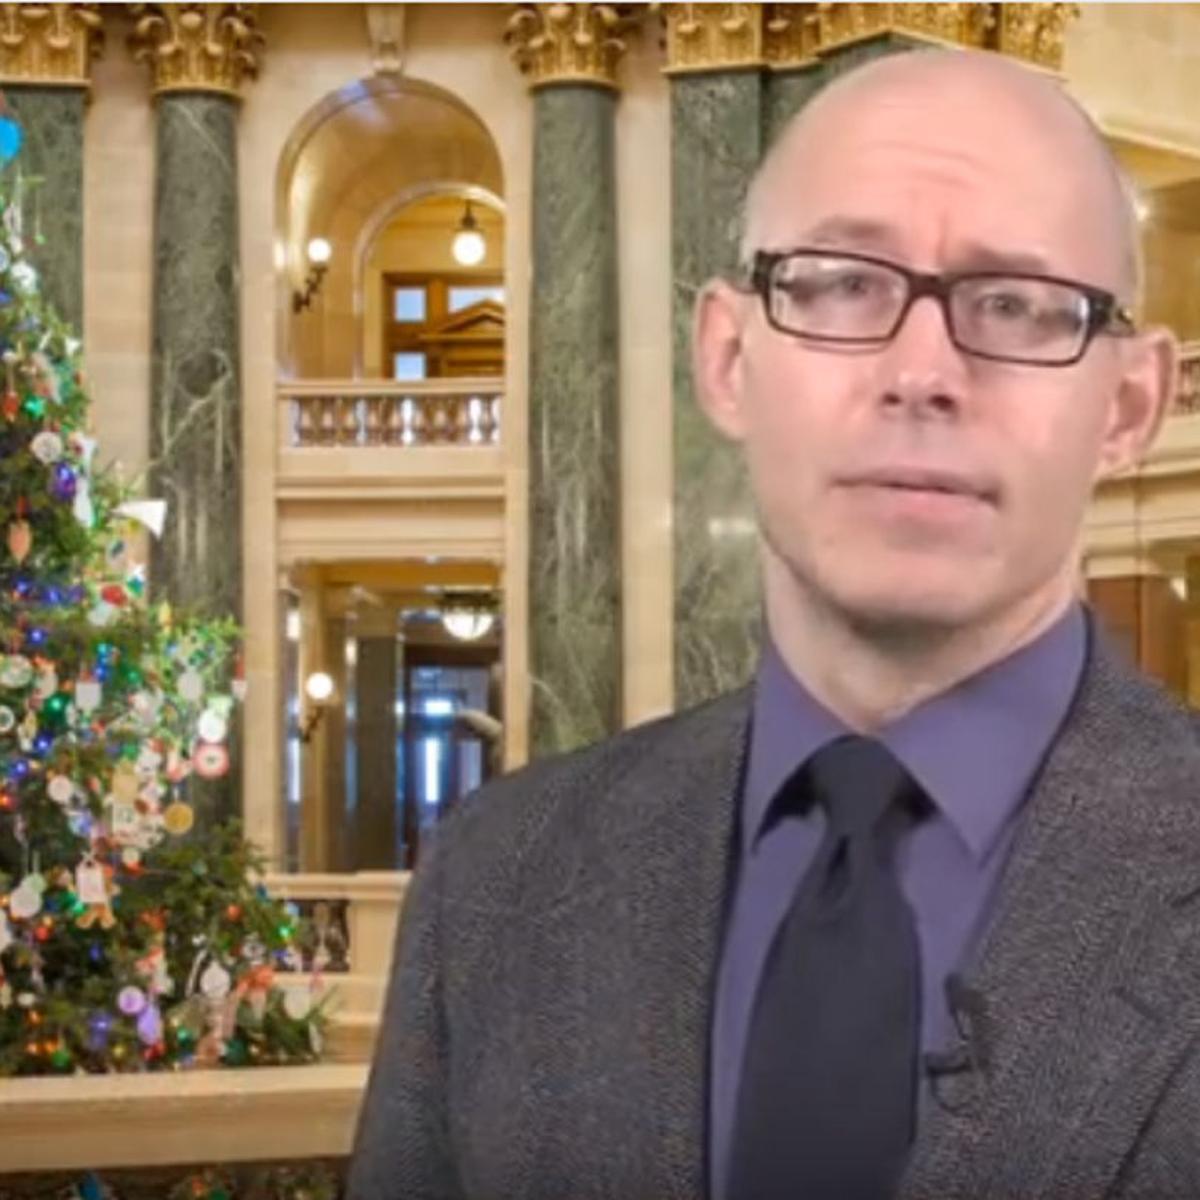 Gop Christmas Message.Gop Lawmaker S Christmas Message Video Draws Complaint